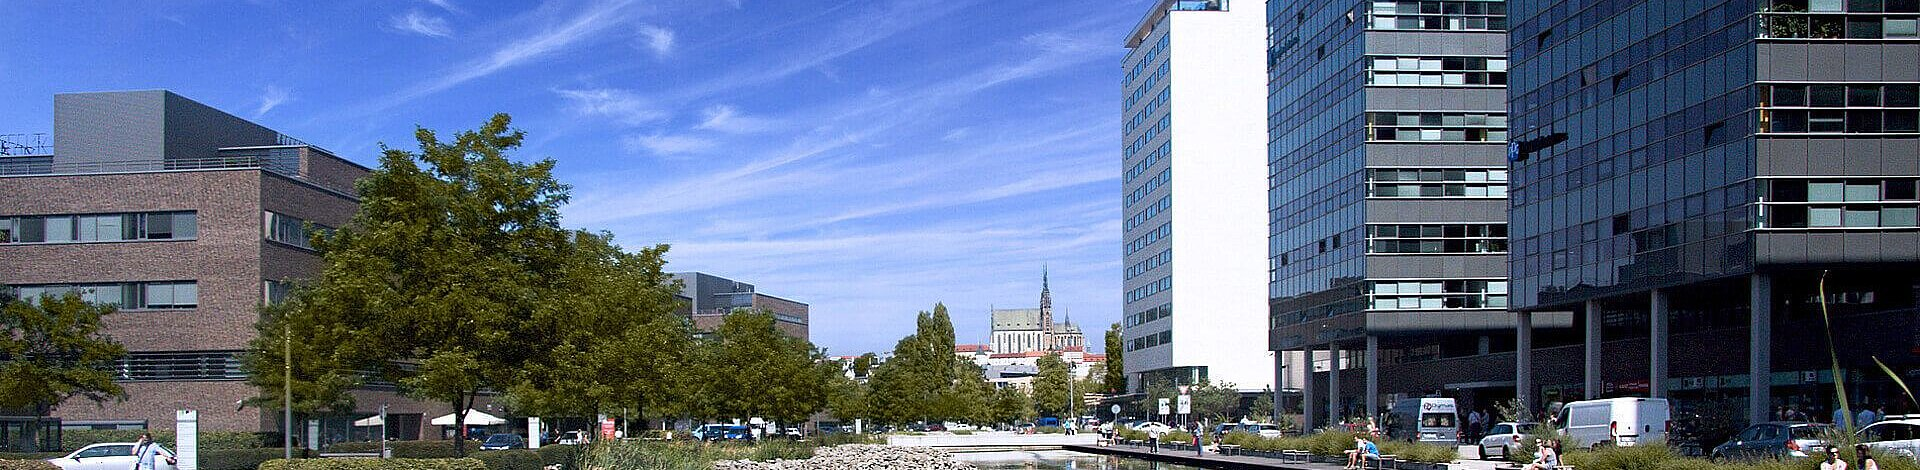 TRESCON Brno - auch in der Tschechei arbeiten TRESCON-Consultants auf höchstem Niveau! TRESCON - Personalberatung, Personalsuche - more than executive search